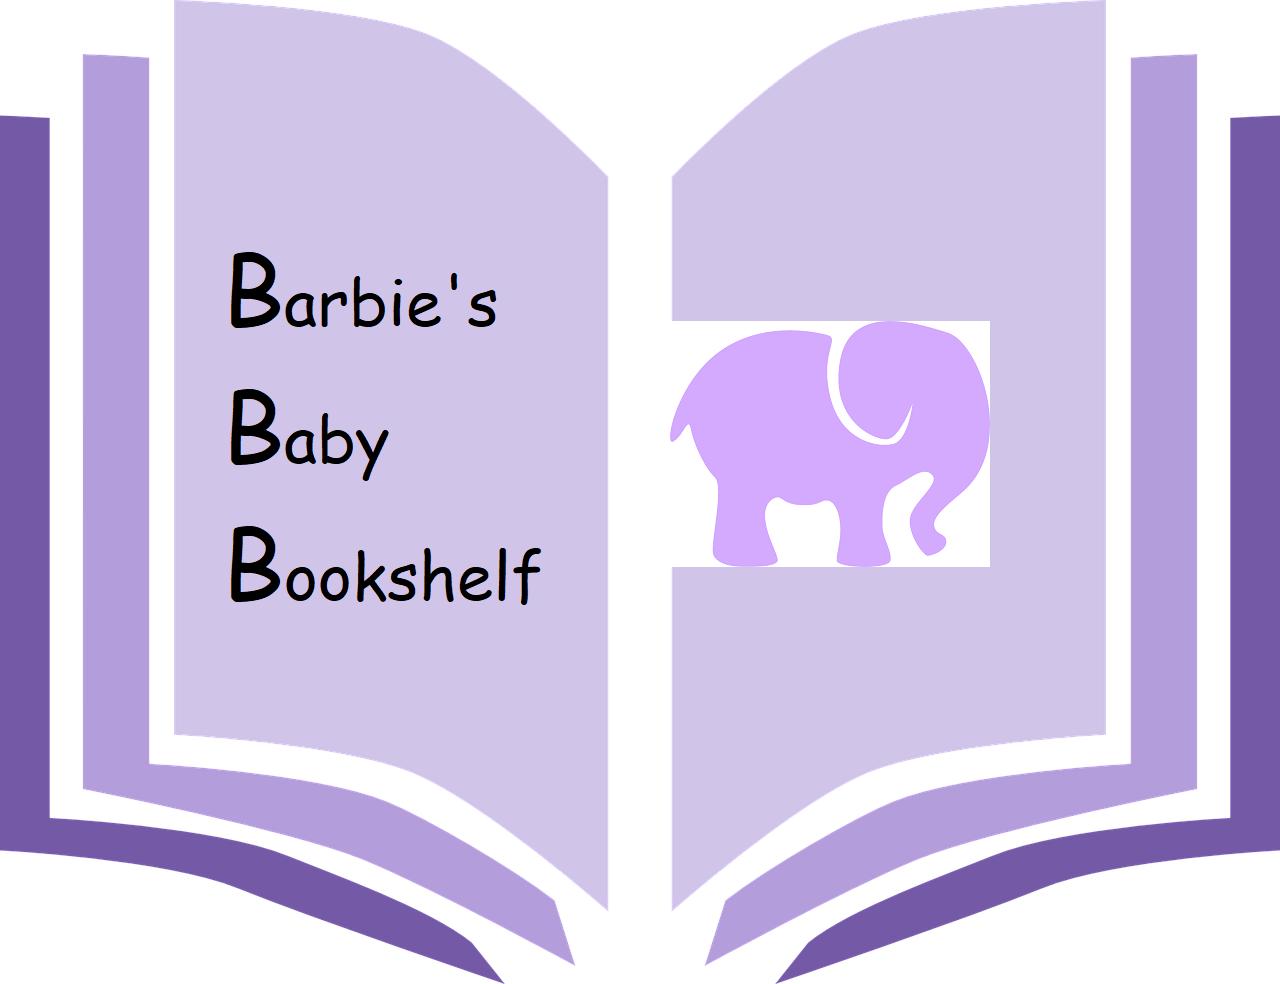 Barbie's Baby Bookshelf